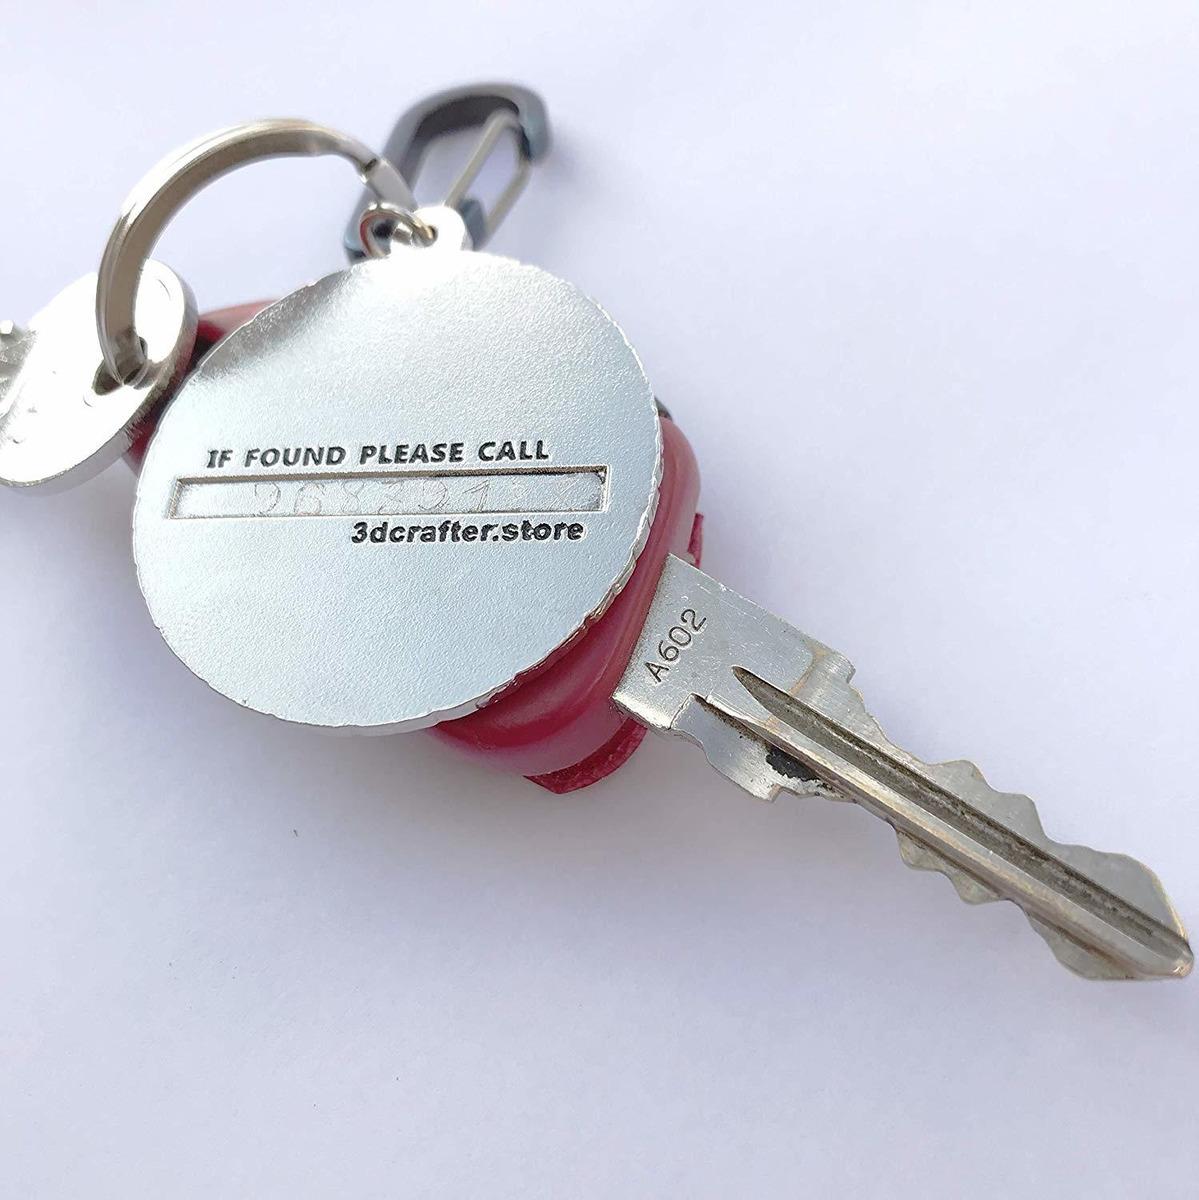 Replica. esmalte Etiqueta de metal cromado Llavero Wrangler para accesorios de coche